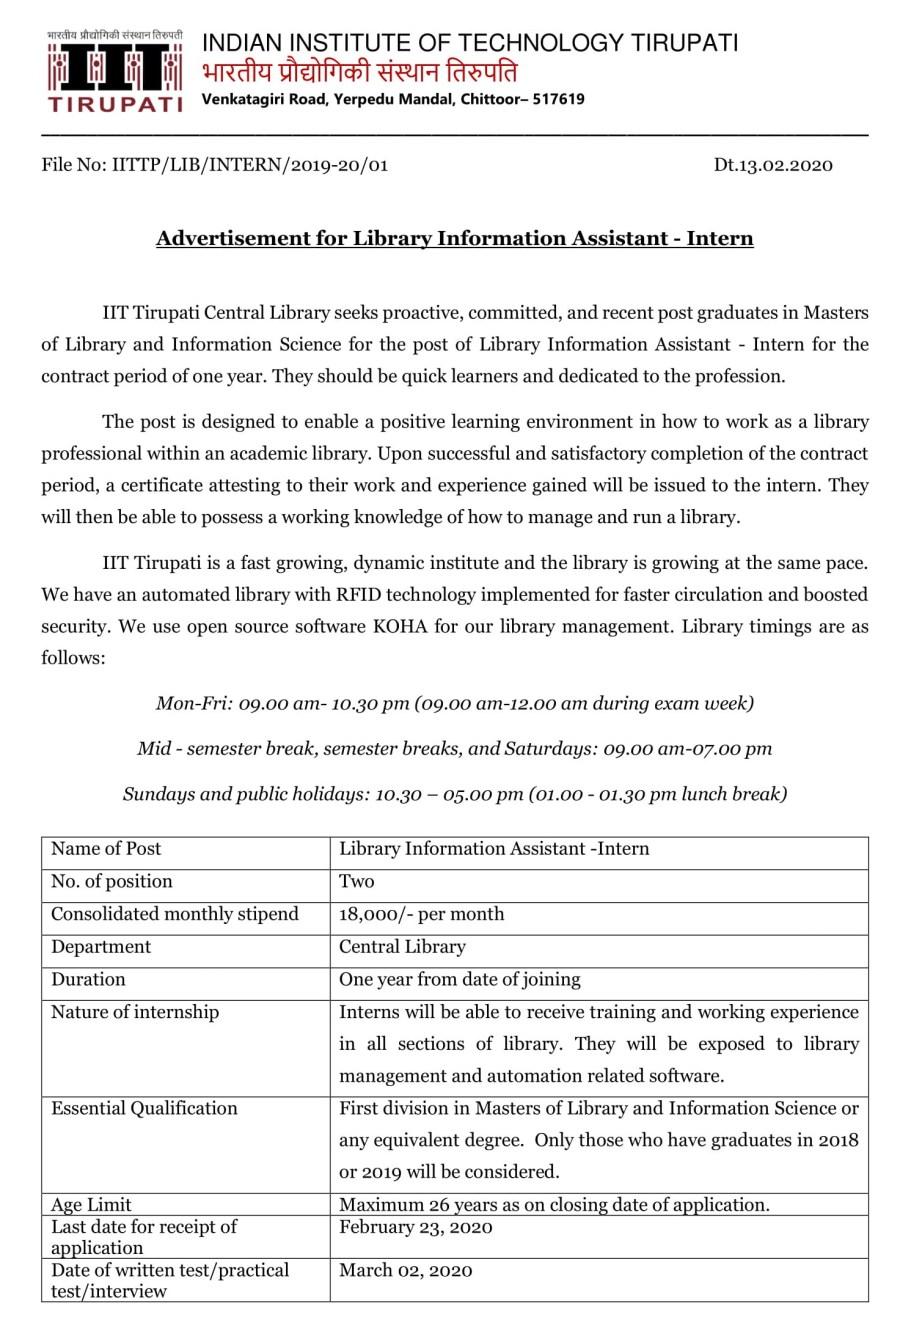 Assistant Interns - Advt-1